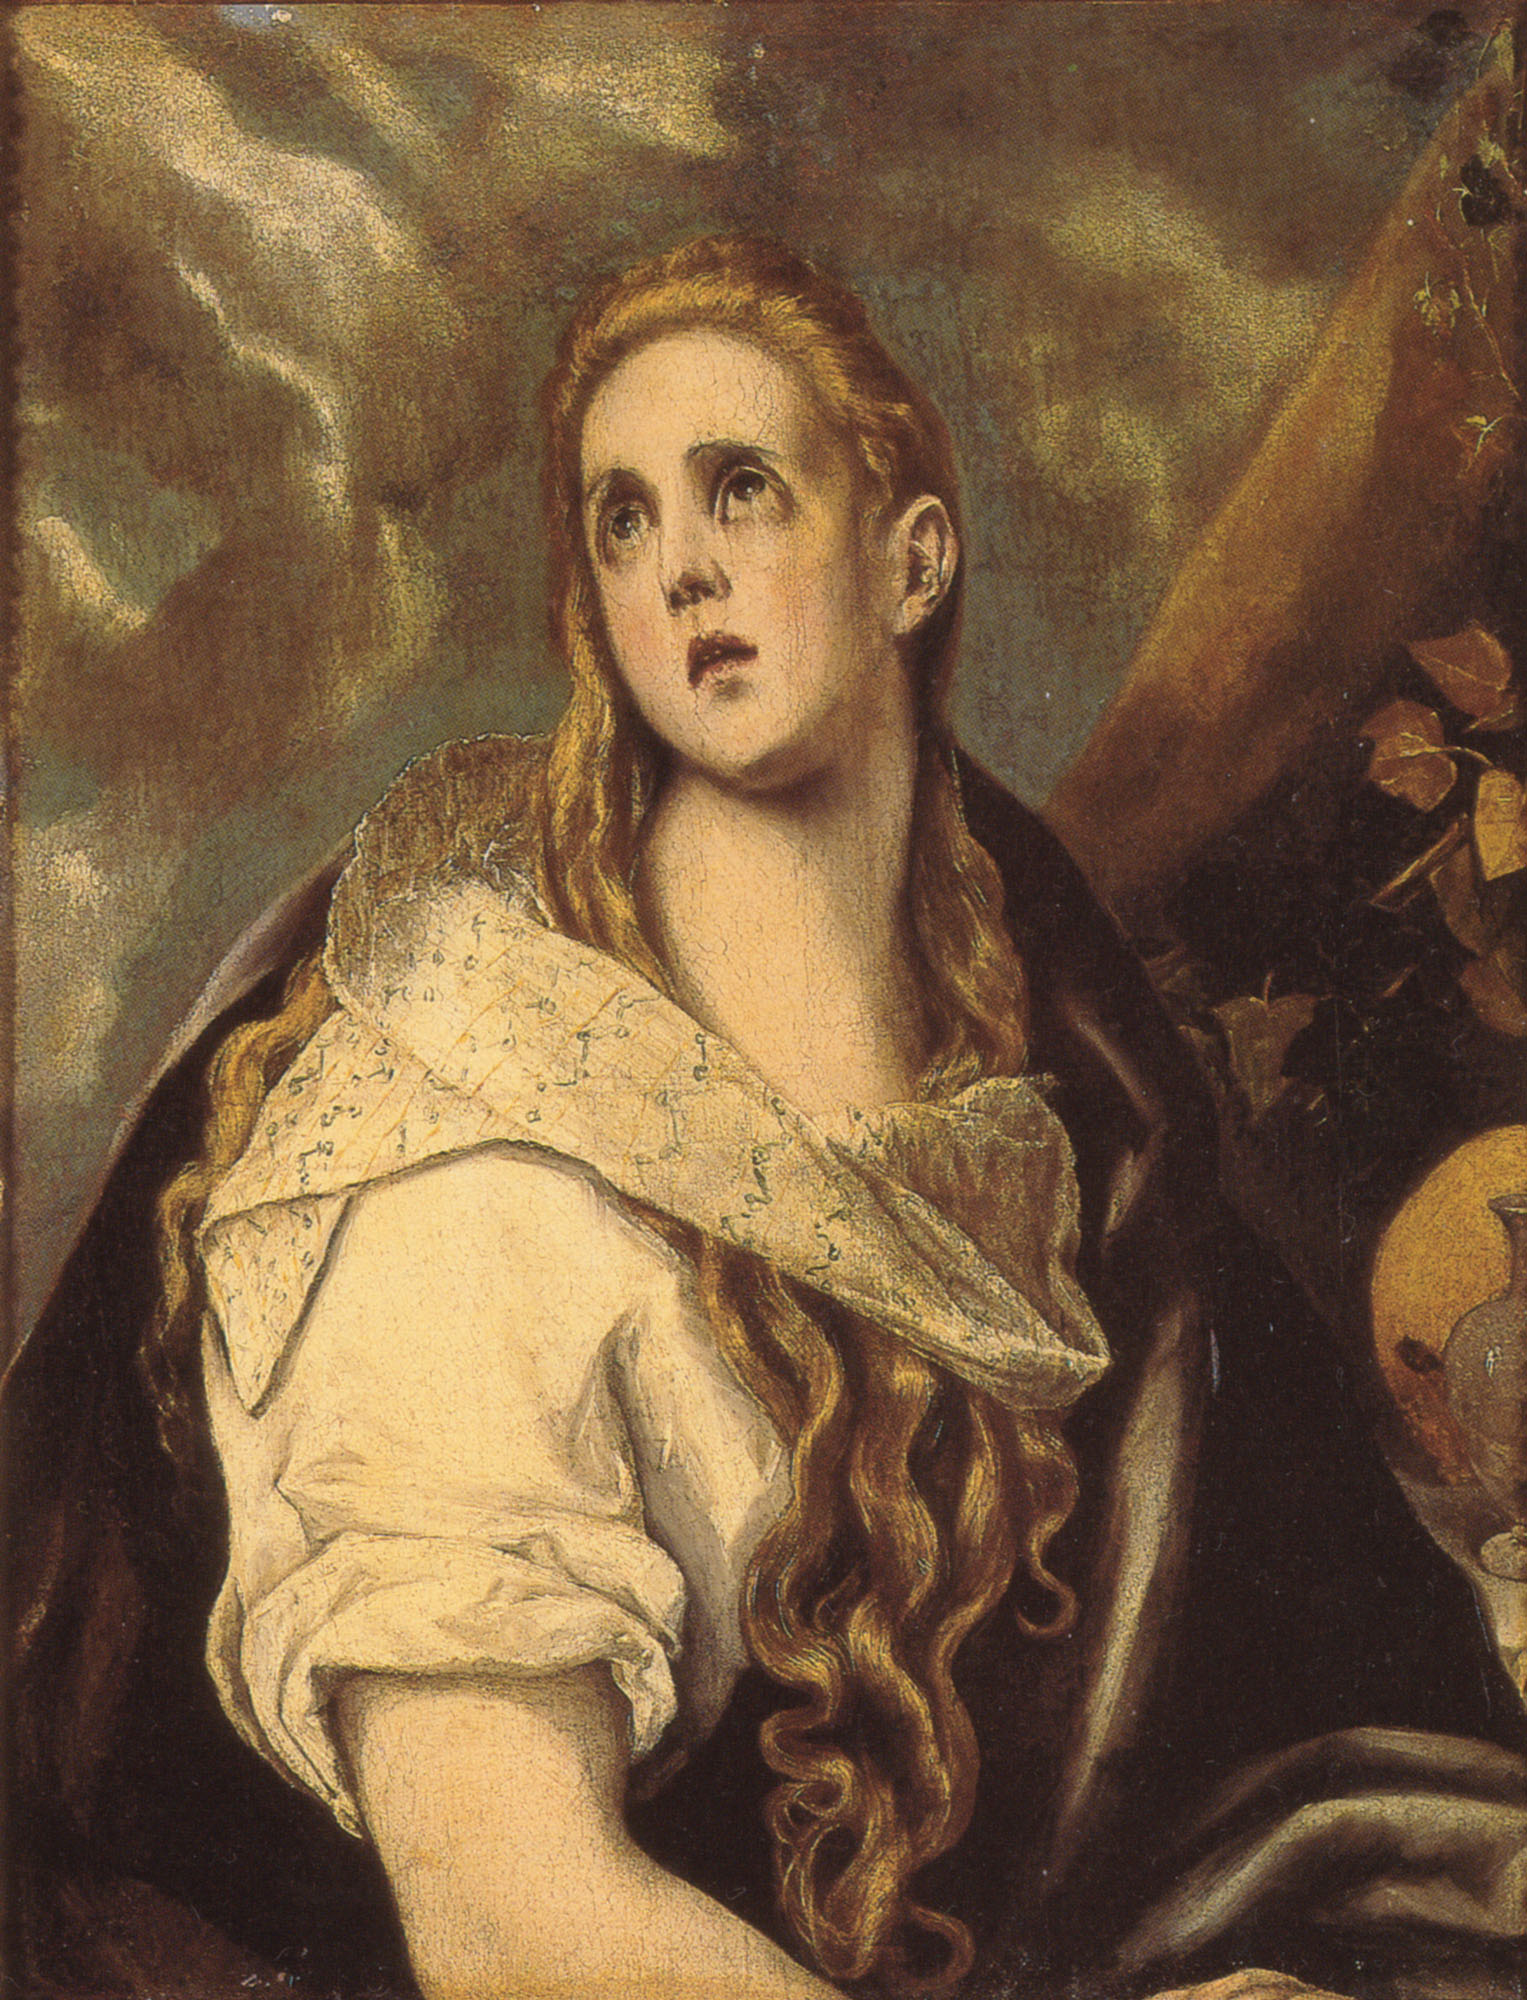 http://uploads6.wikipaintings.org/images/el-greco/the-penitent-magdalene-1578.jpg